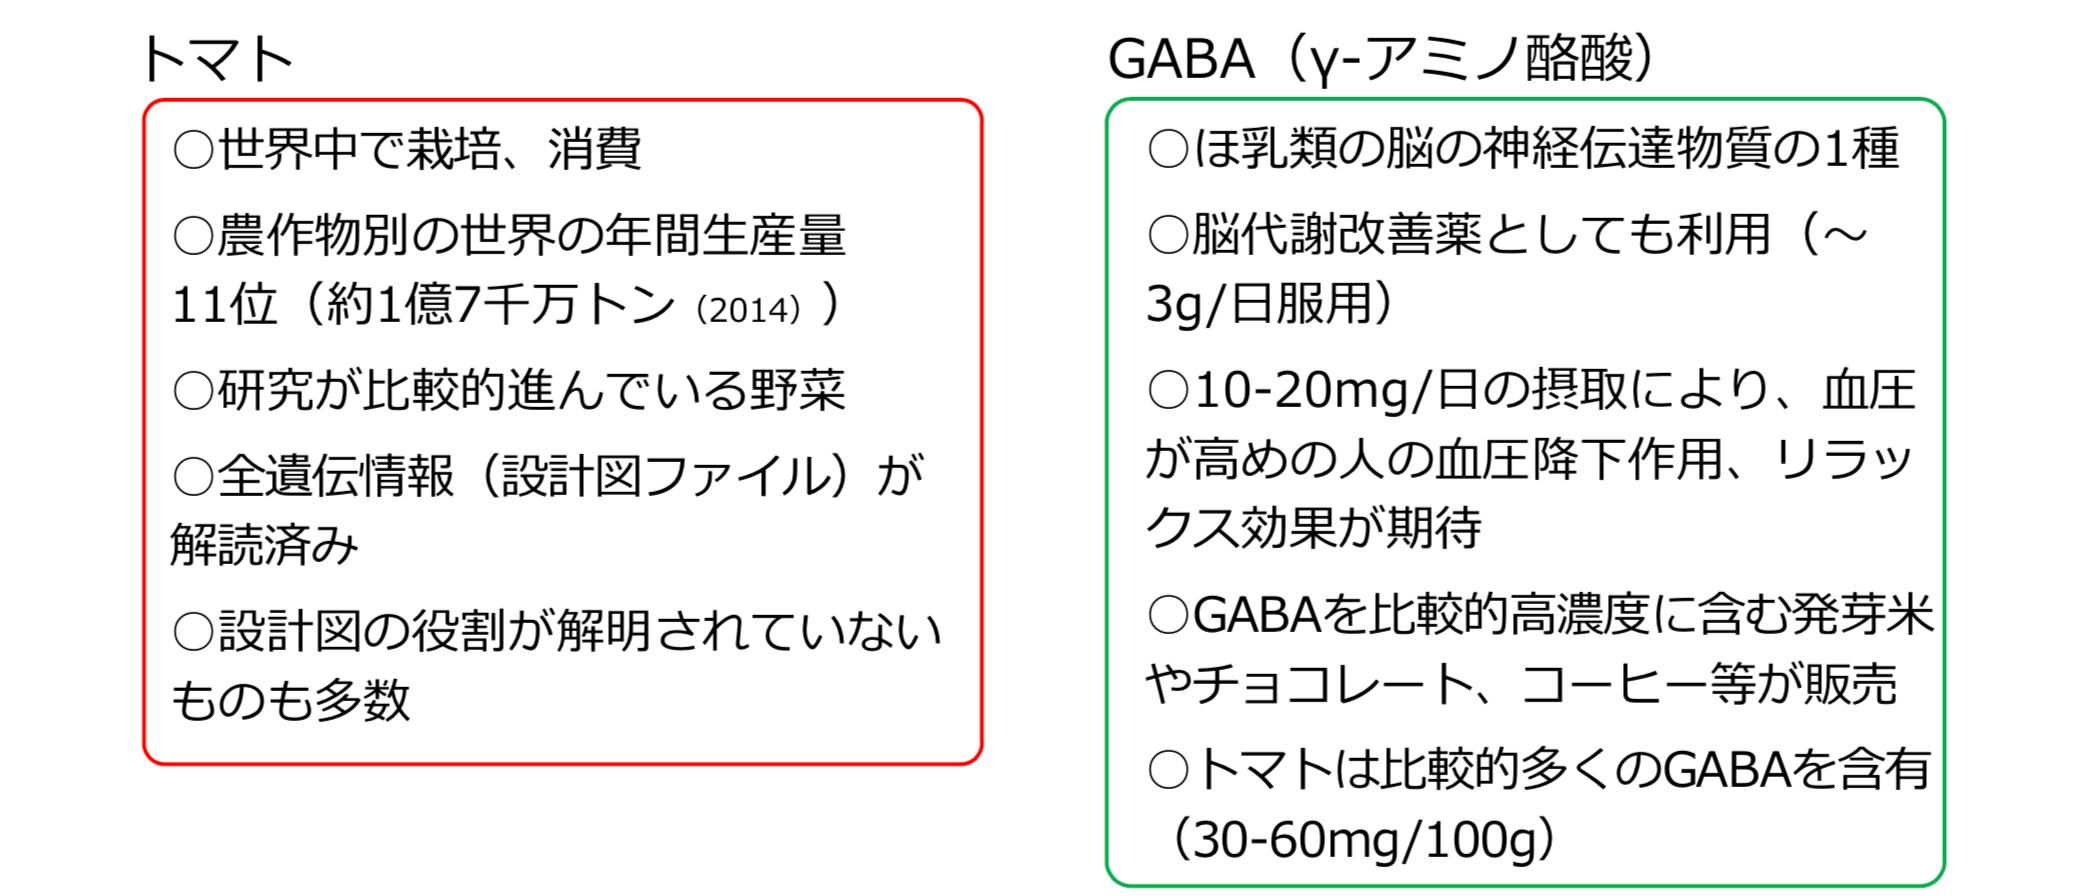 GABA高含有トマトの開発